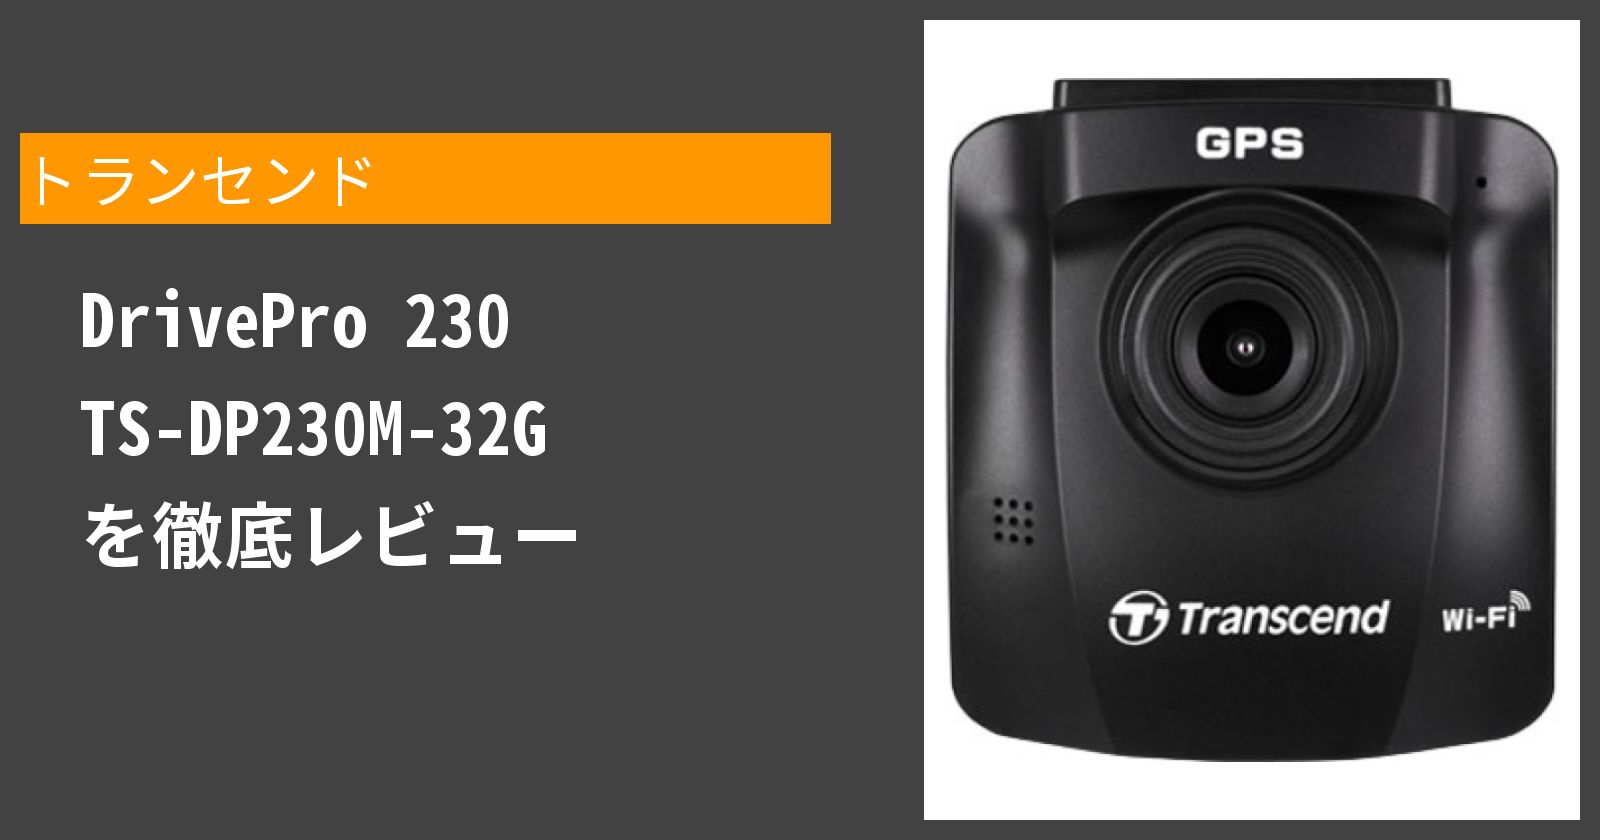 DrivePro 230 TS-DP230M-32Gを徹底評価